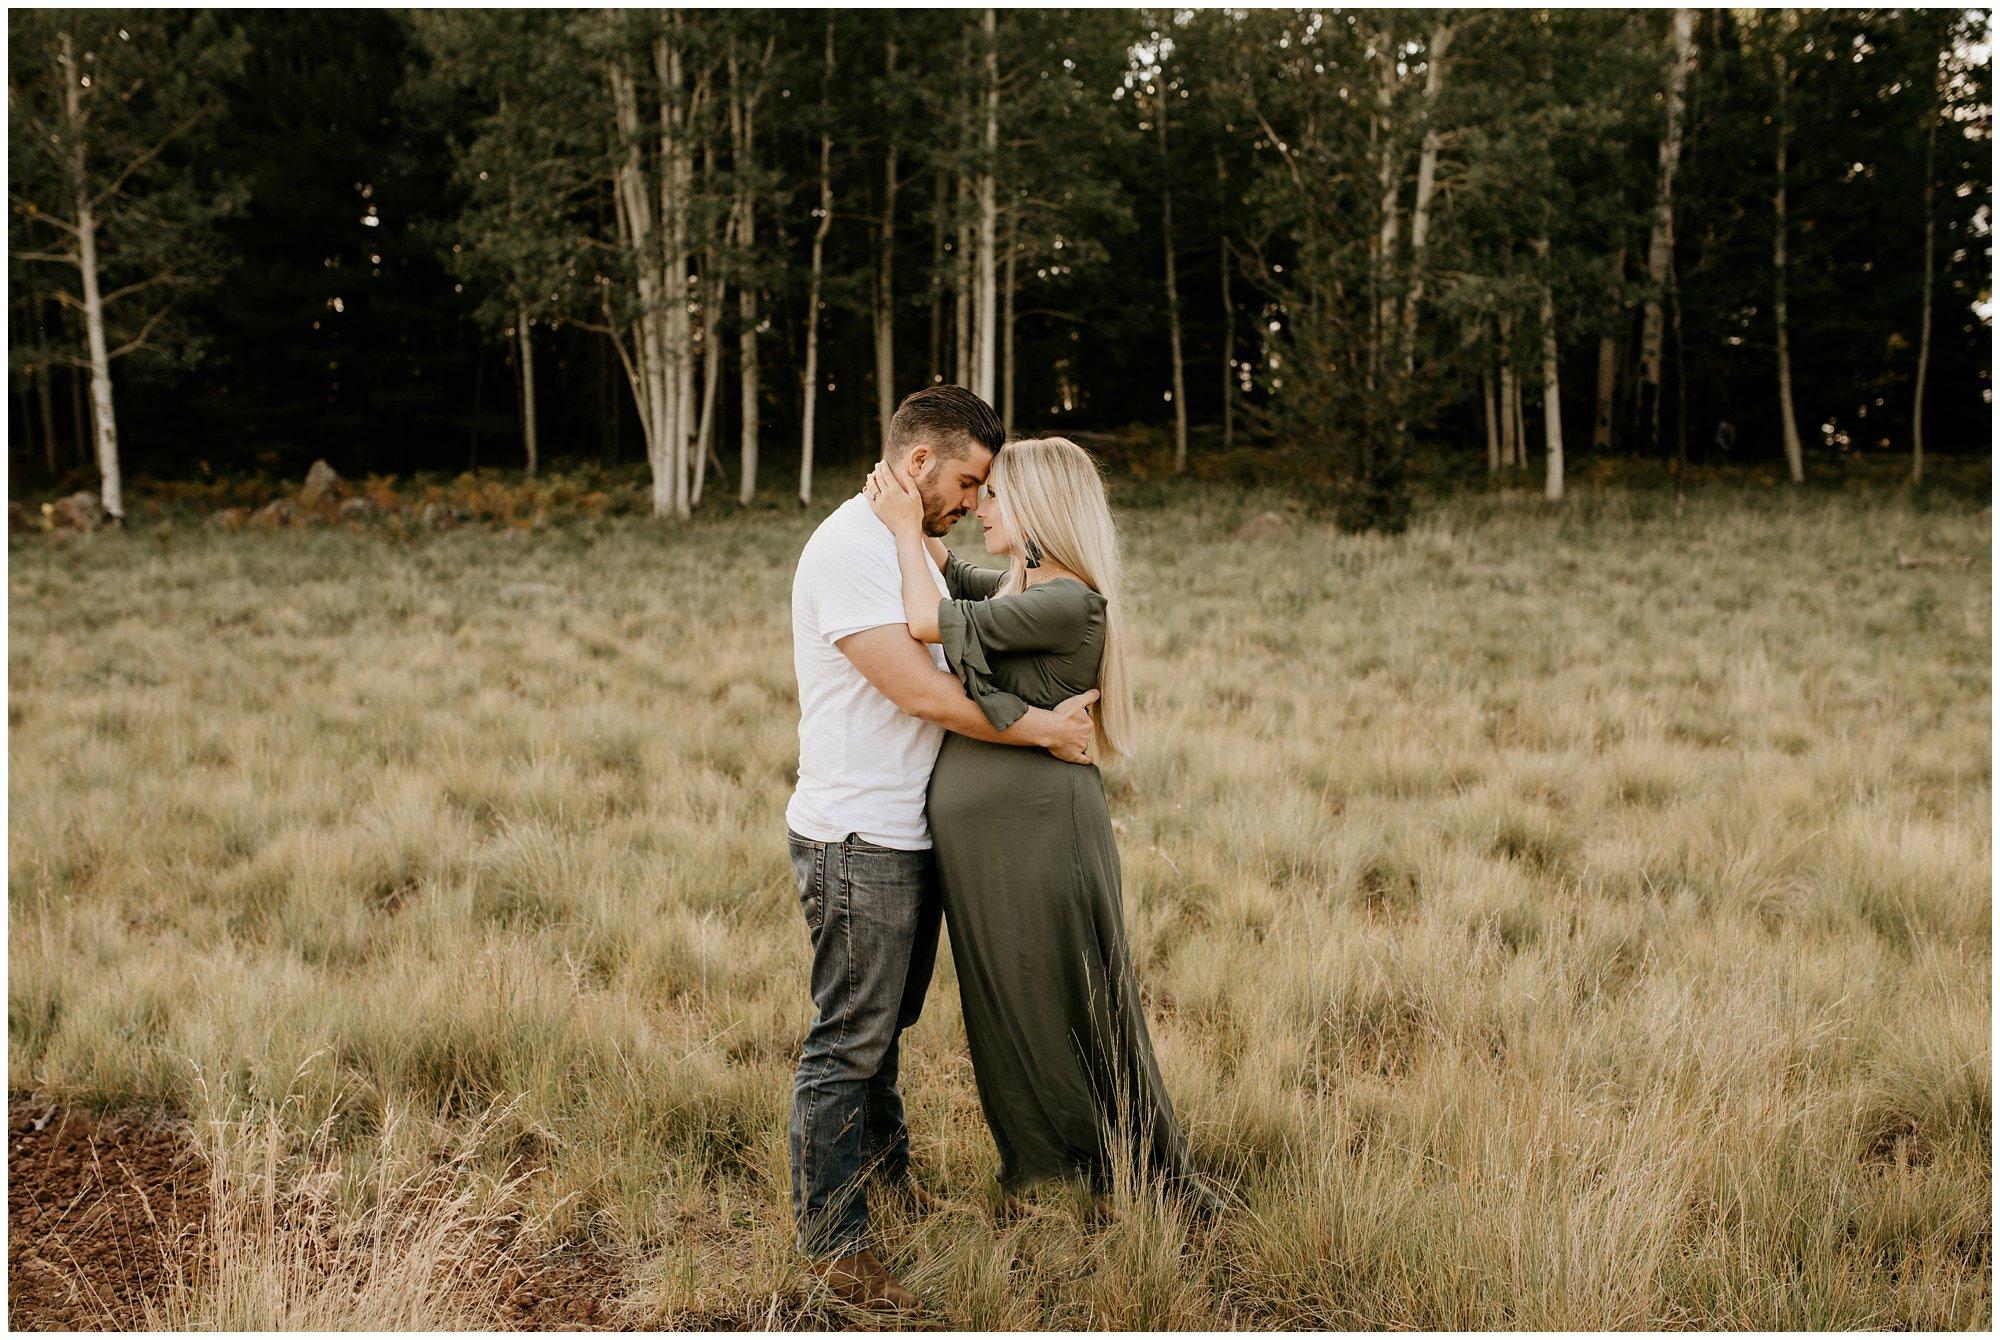 Flagstaff Aspen Tree Portrait Session - Gabby + Gary - Ashtyn Nicole Photo_0002.jpg